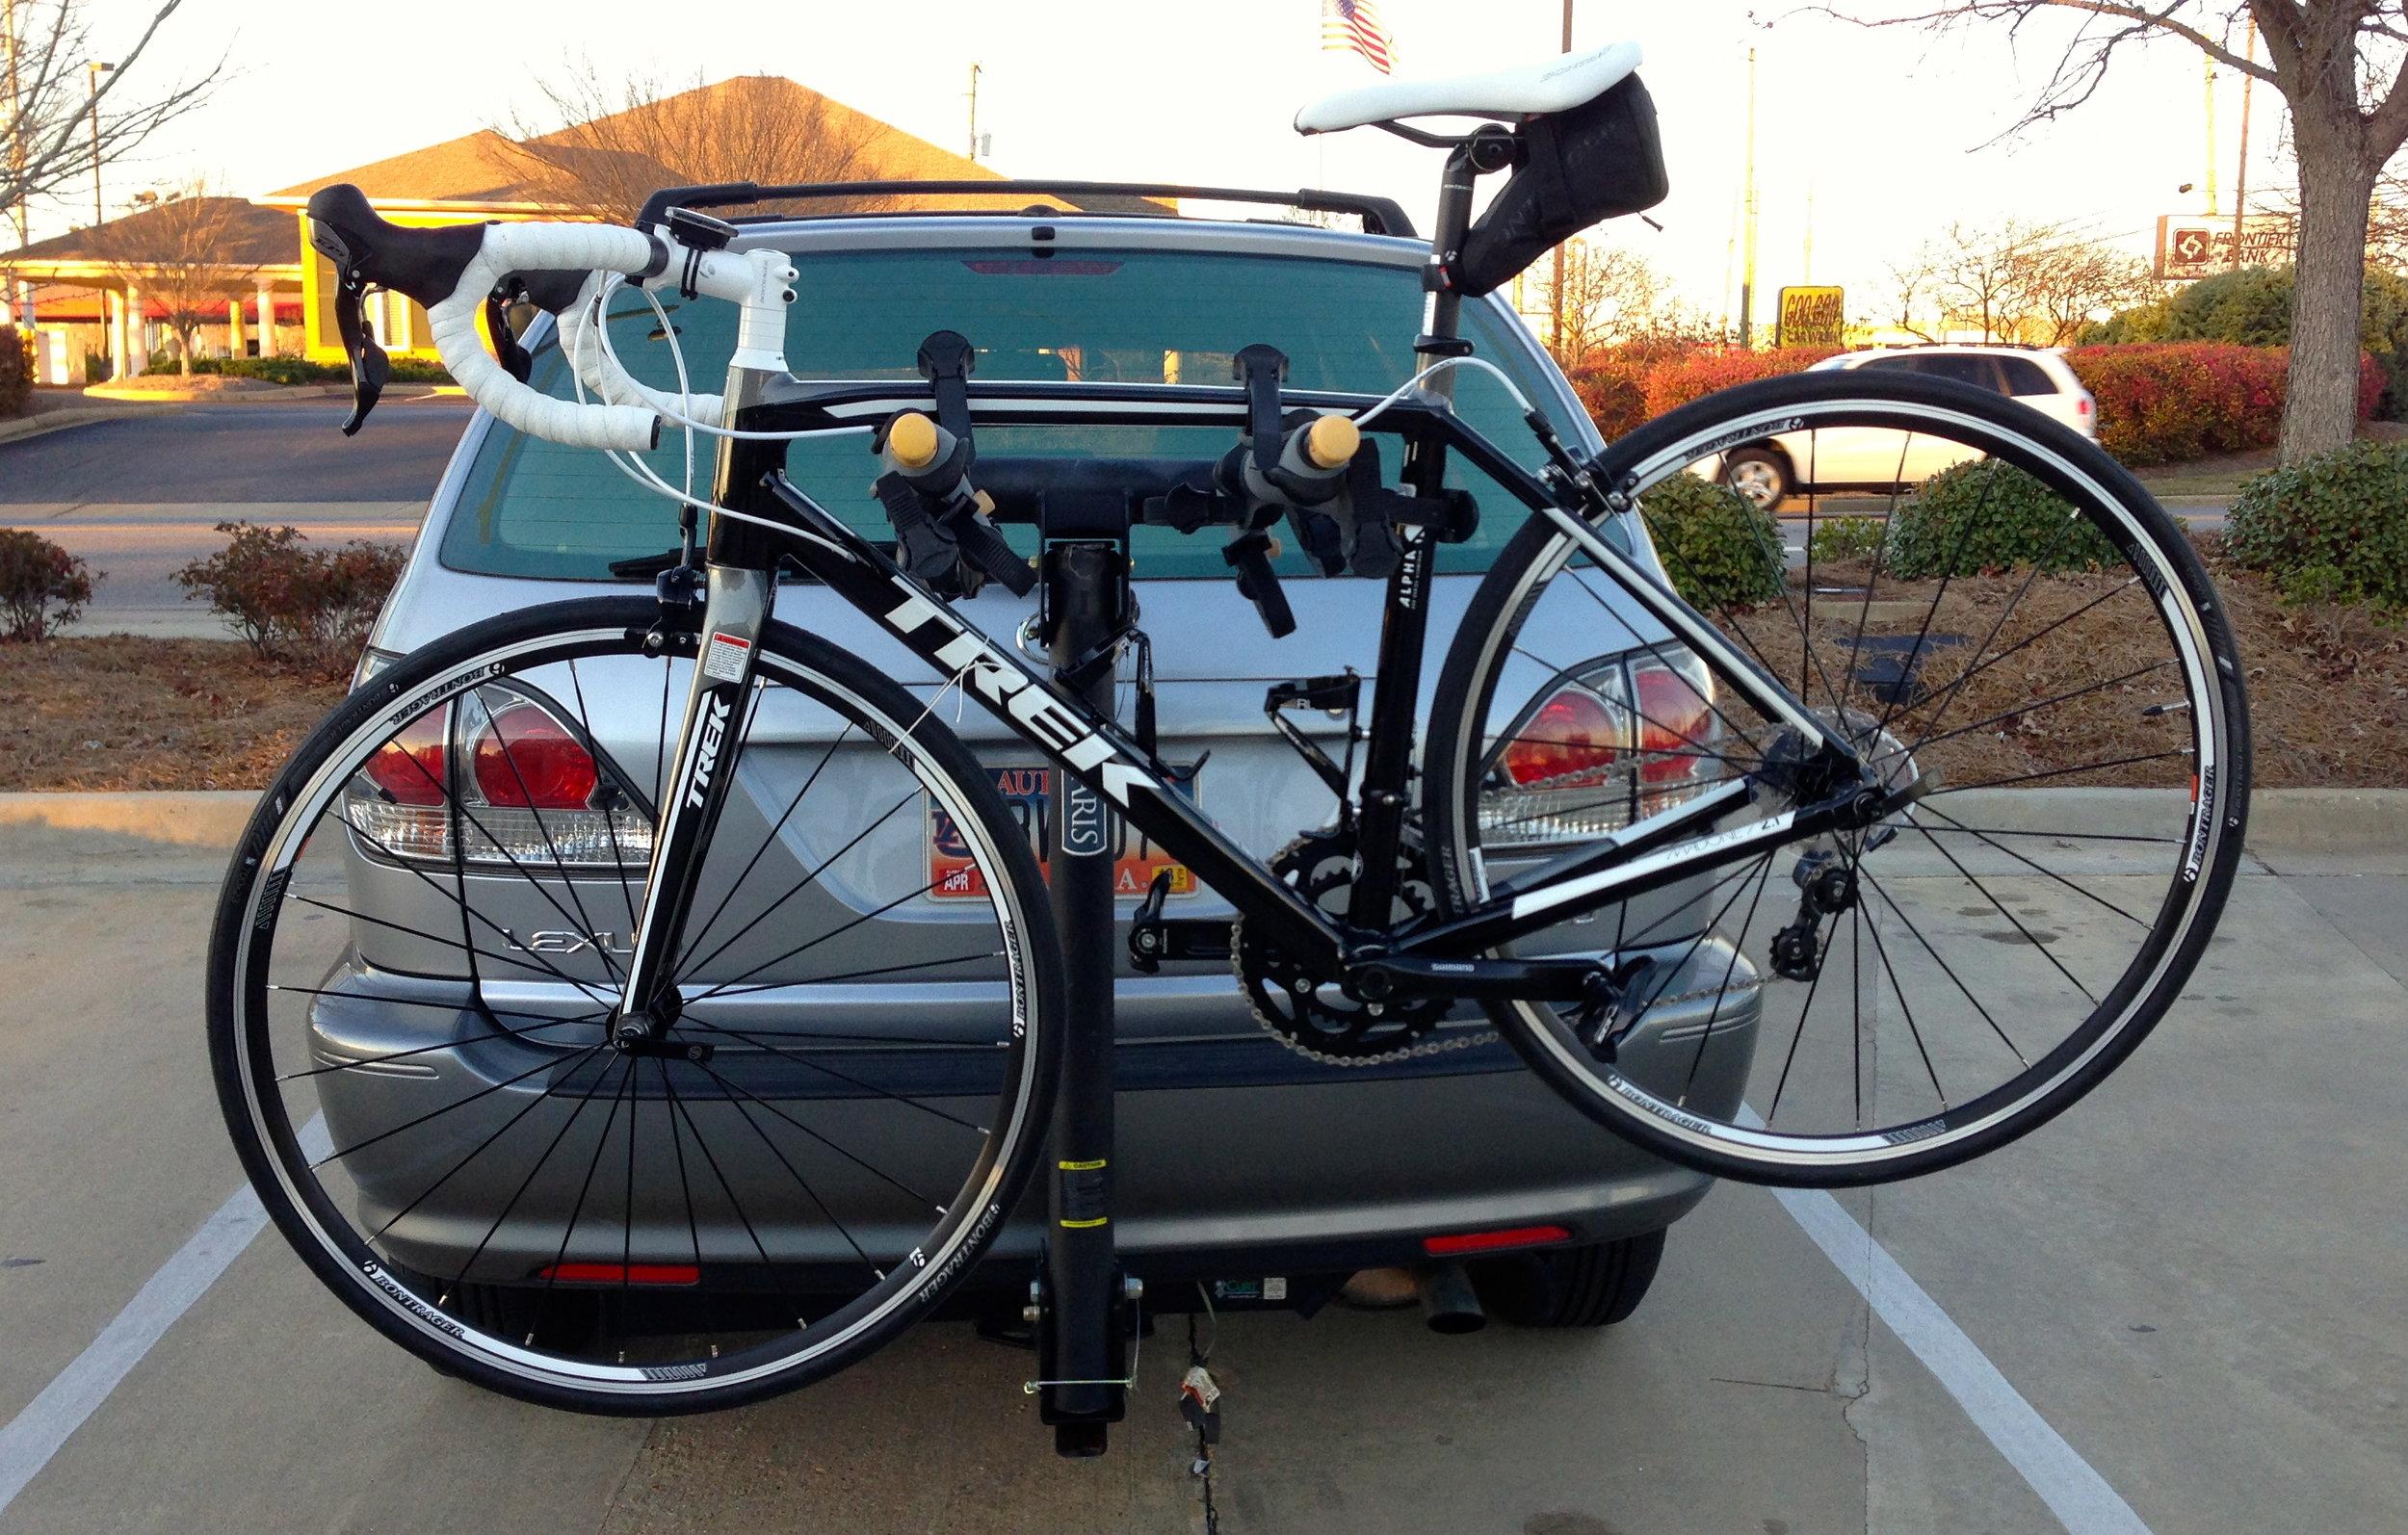 Trek Madone 2.1 on the Car Rack